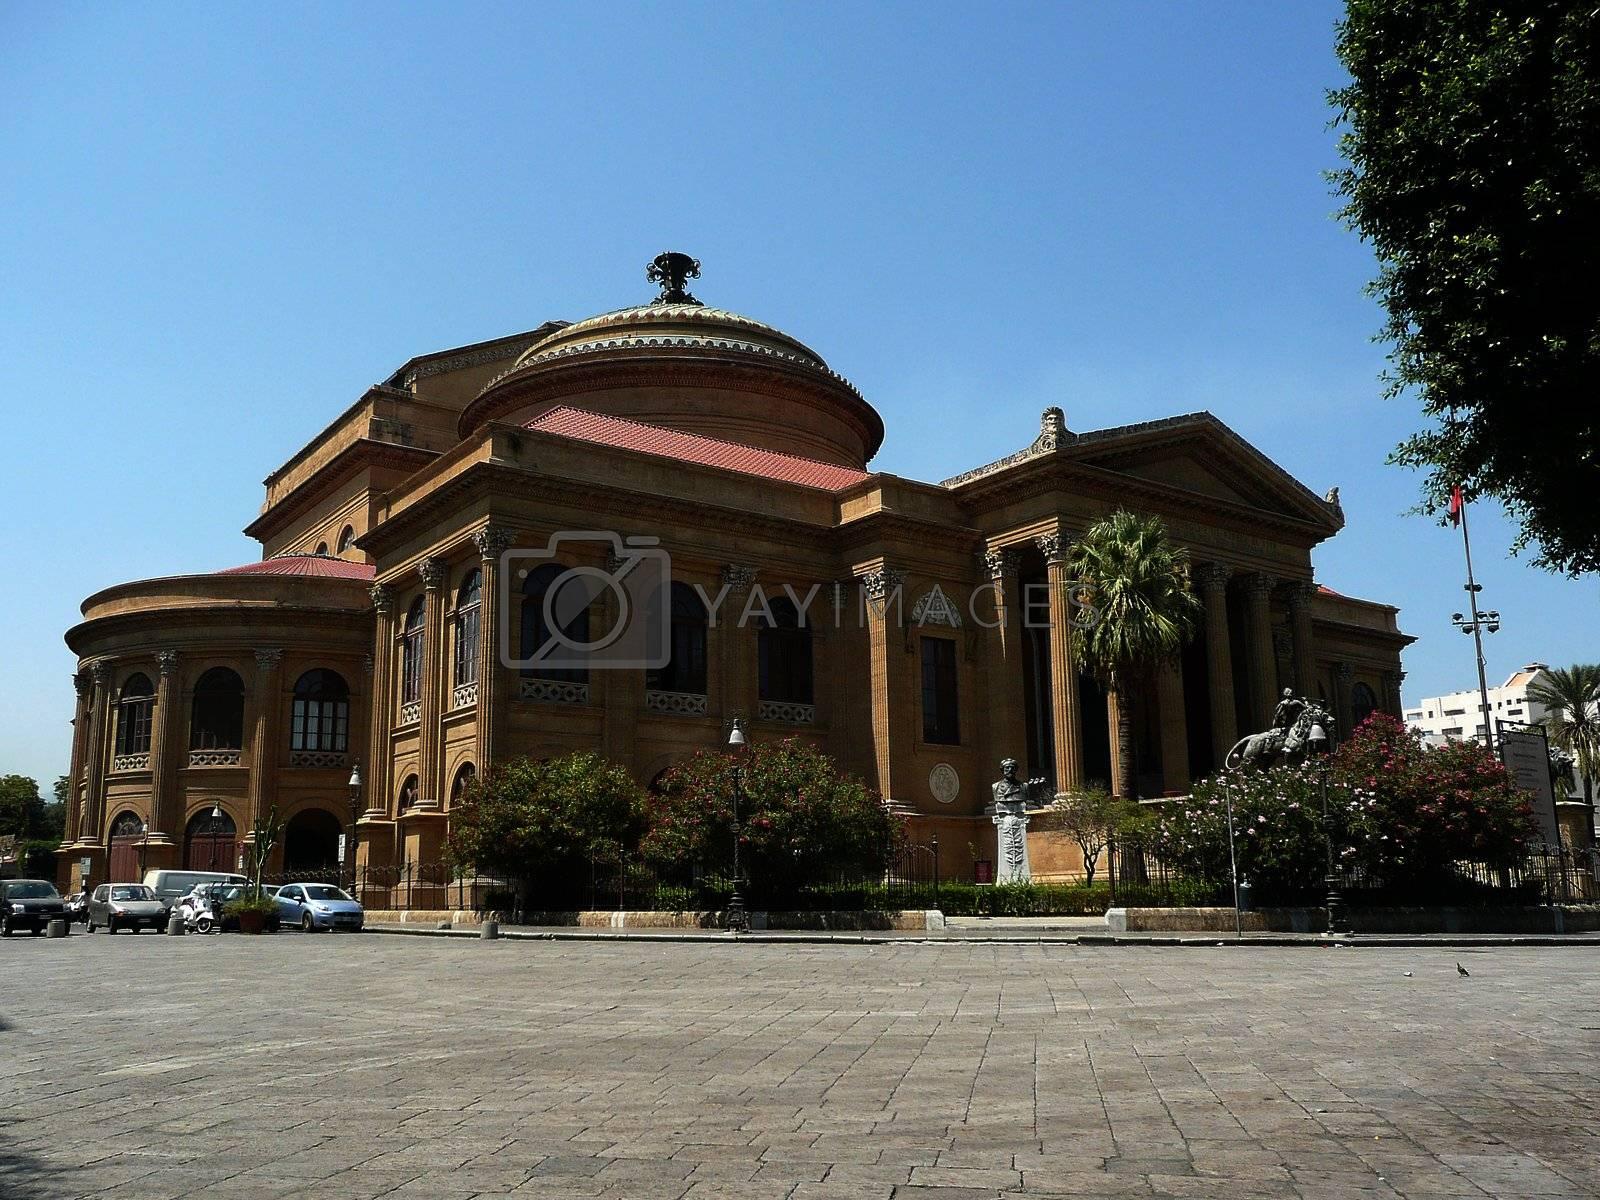 Teatro Massimo Opera House, Palermo, Italy by Marco Rubino